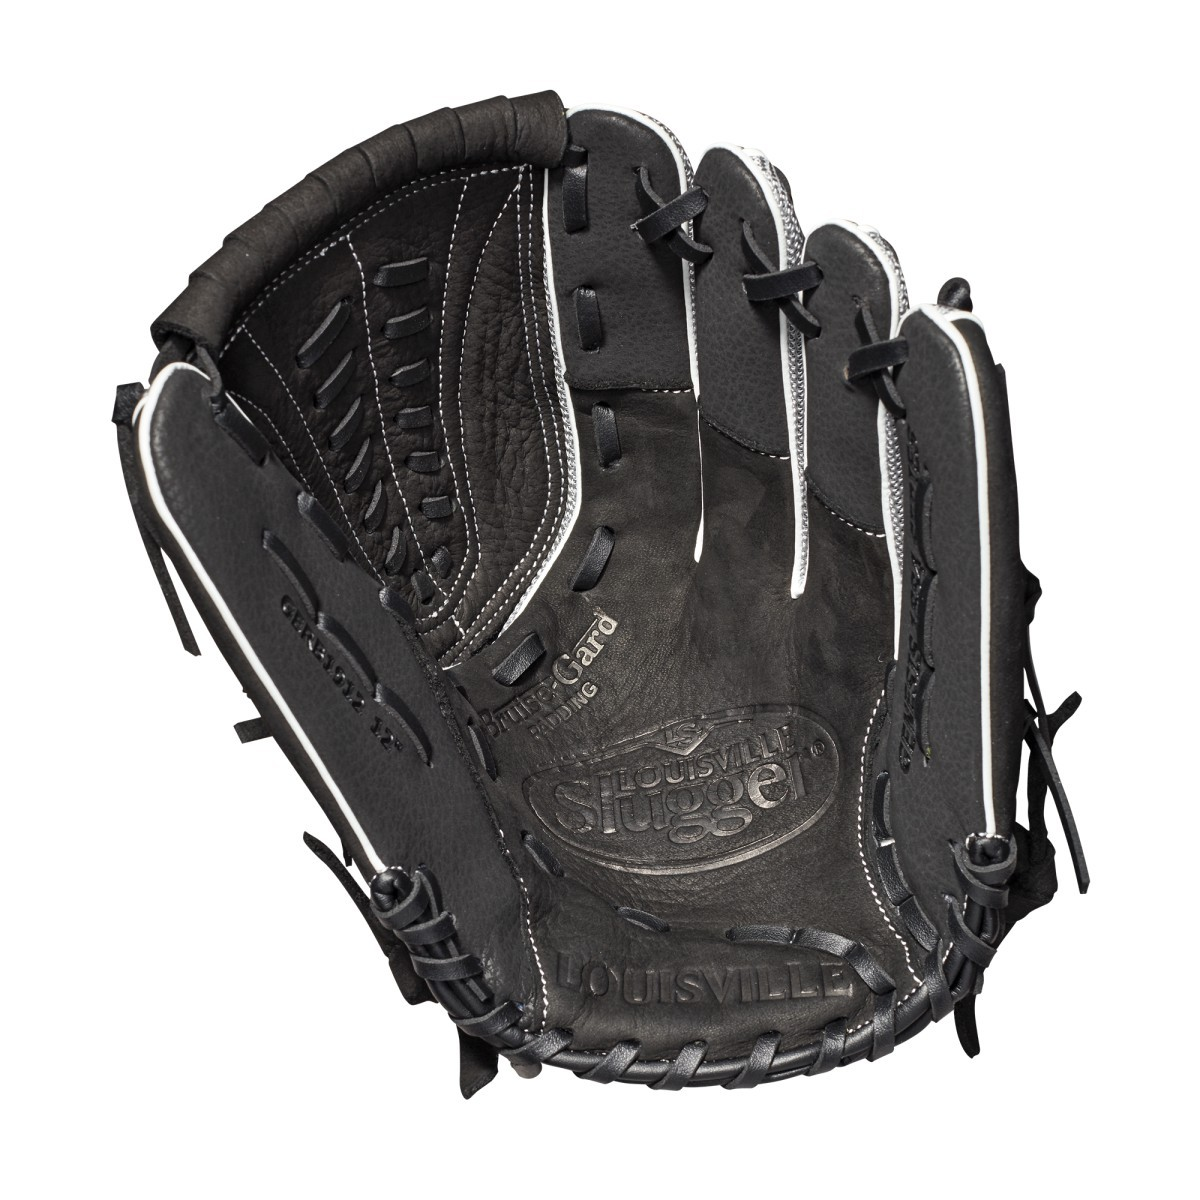 Louisville Slugger Genesis 12 Inch Baseball Glove - Right Hand Thrower